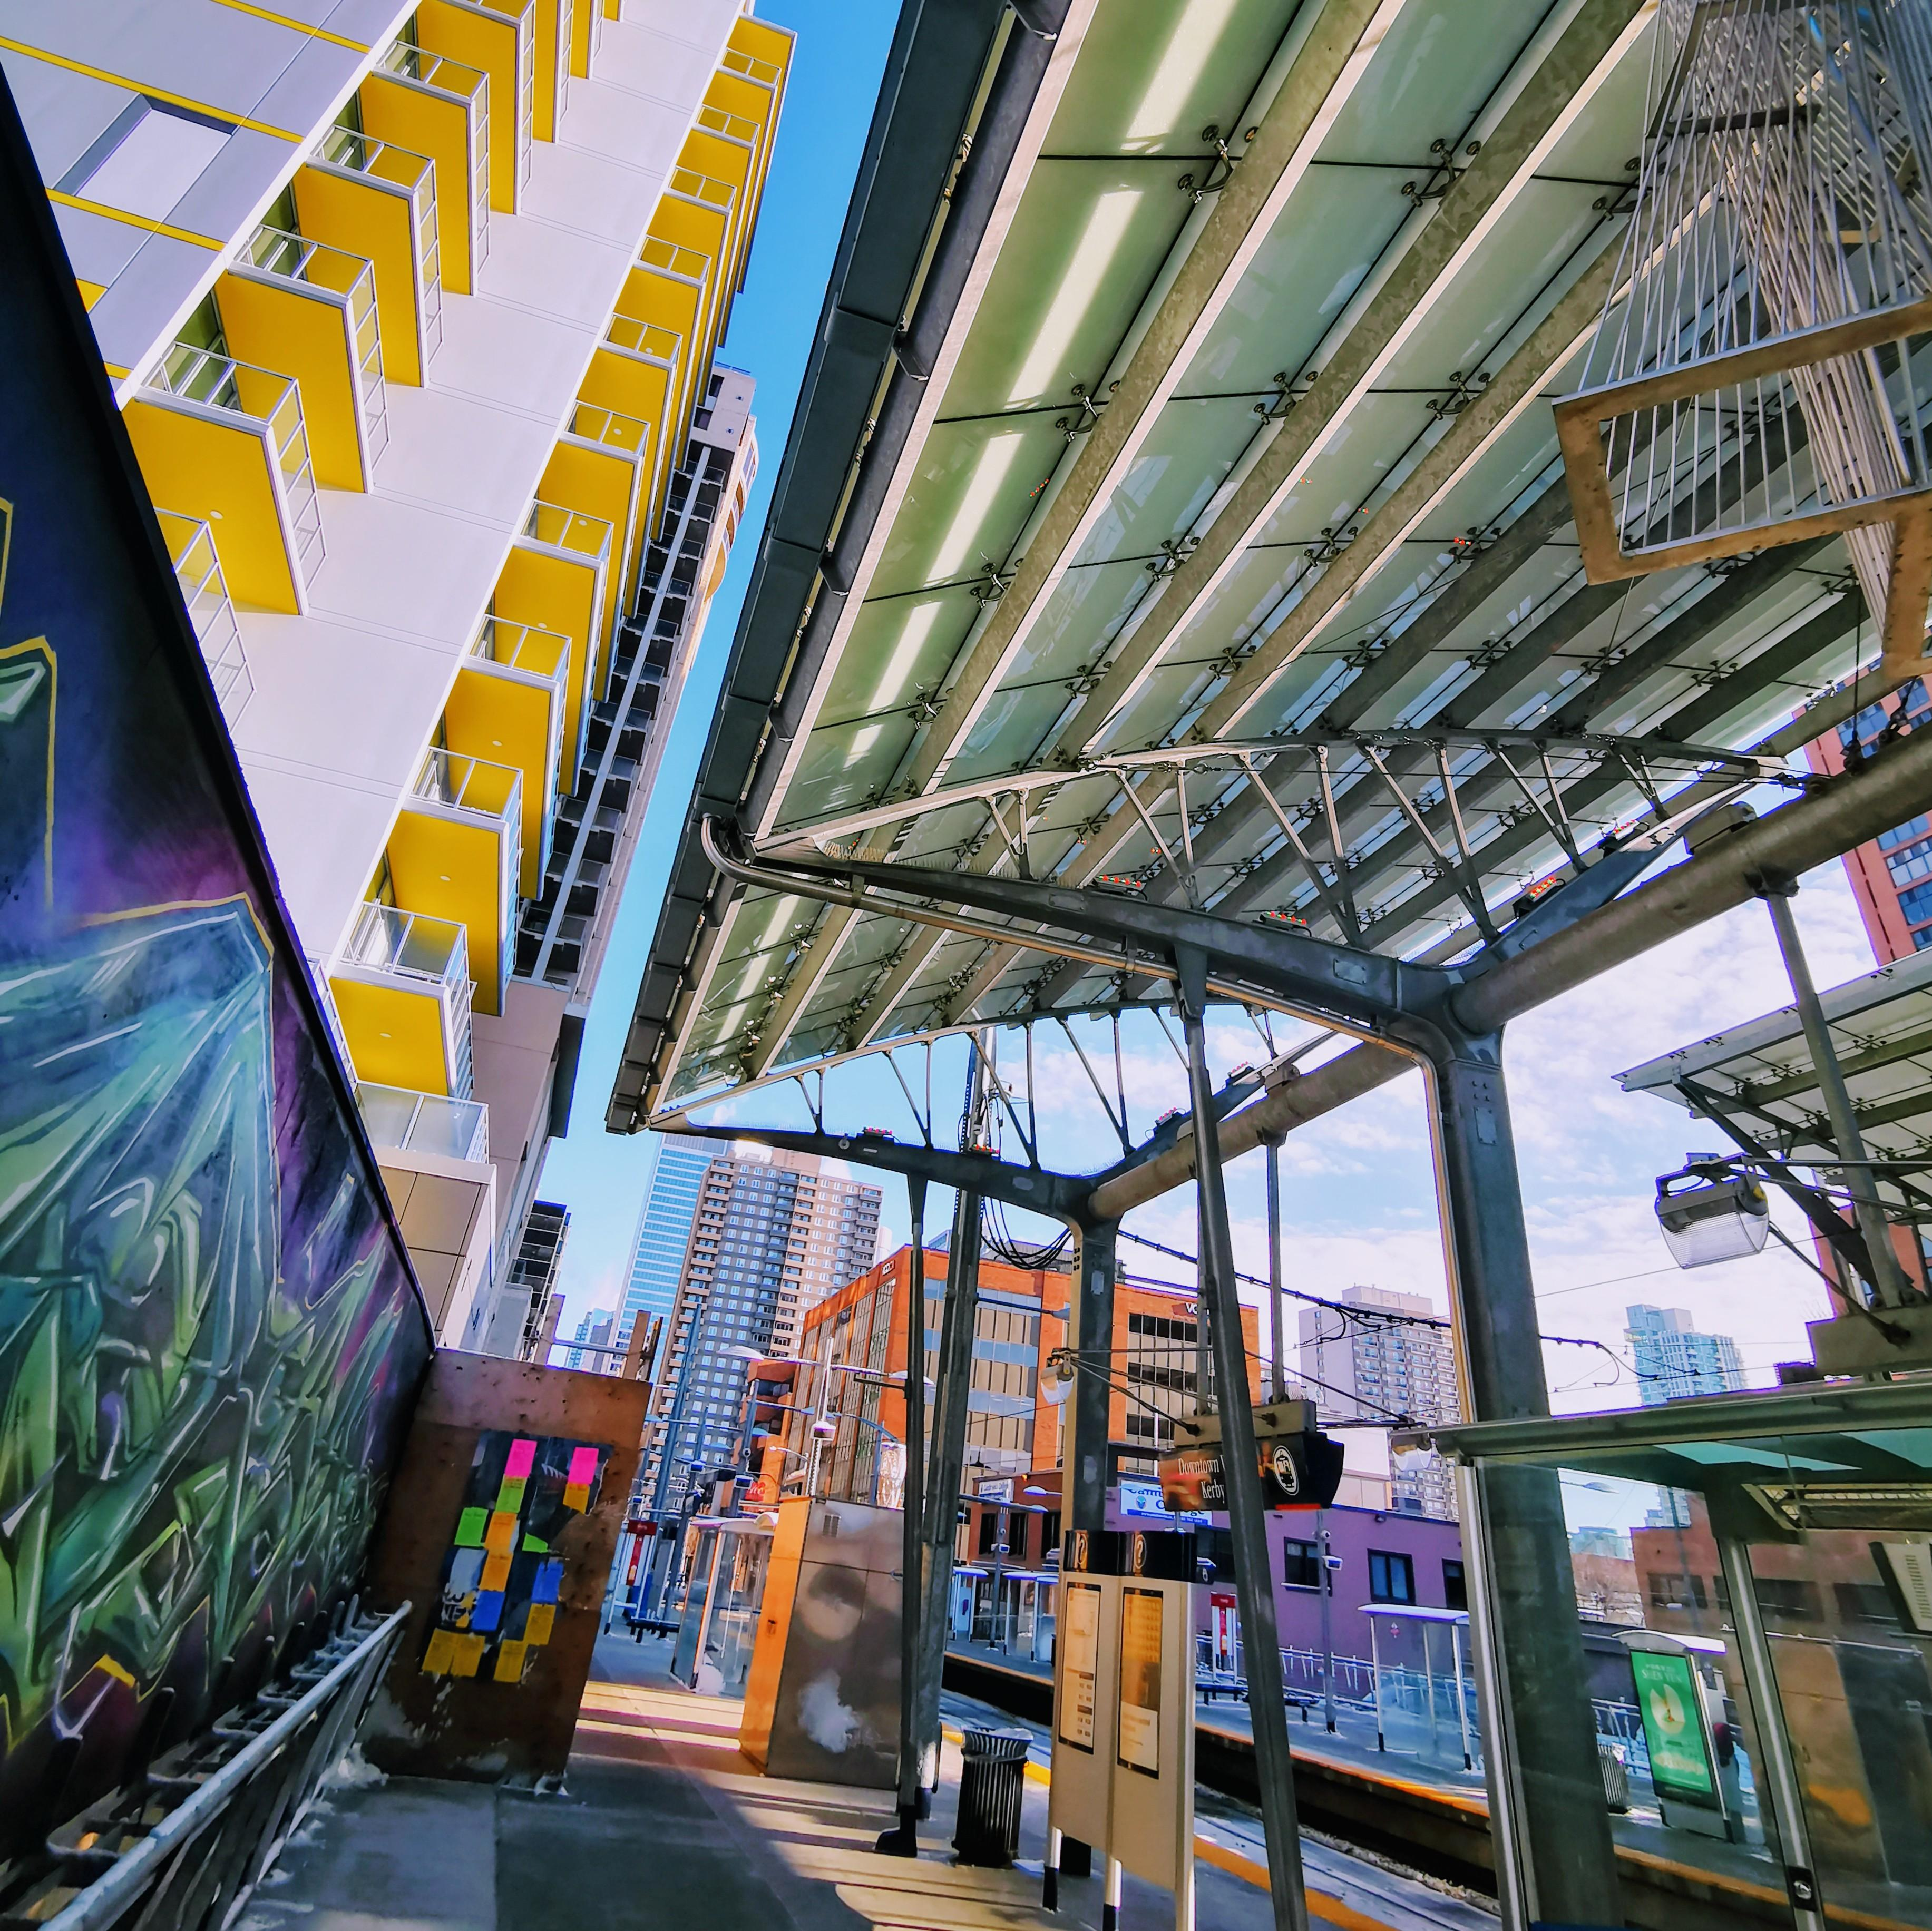 Downtown West Community Association 2020 AGM